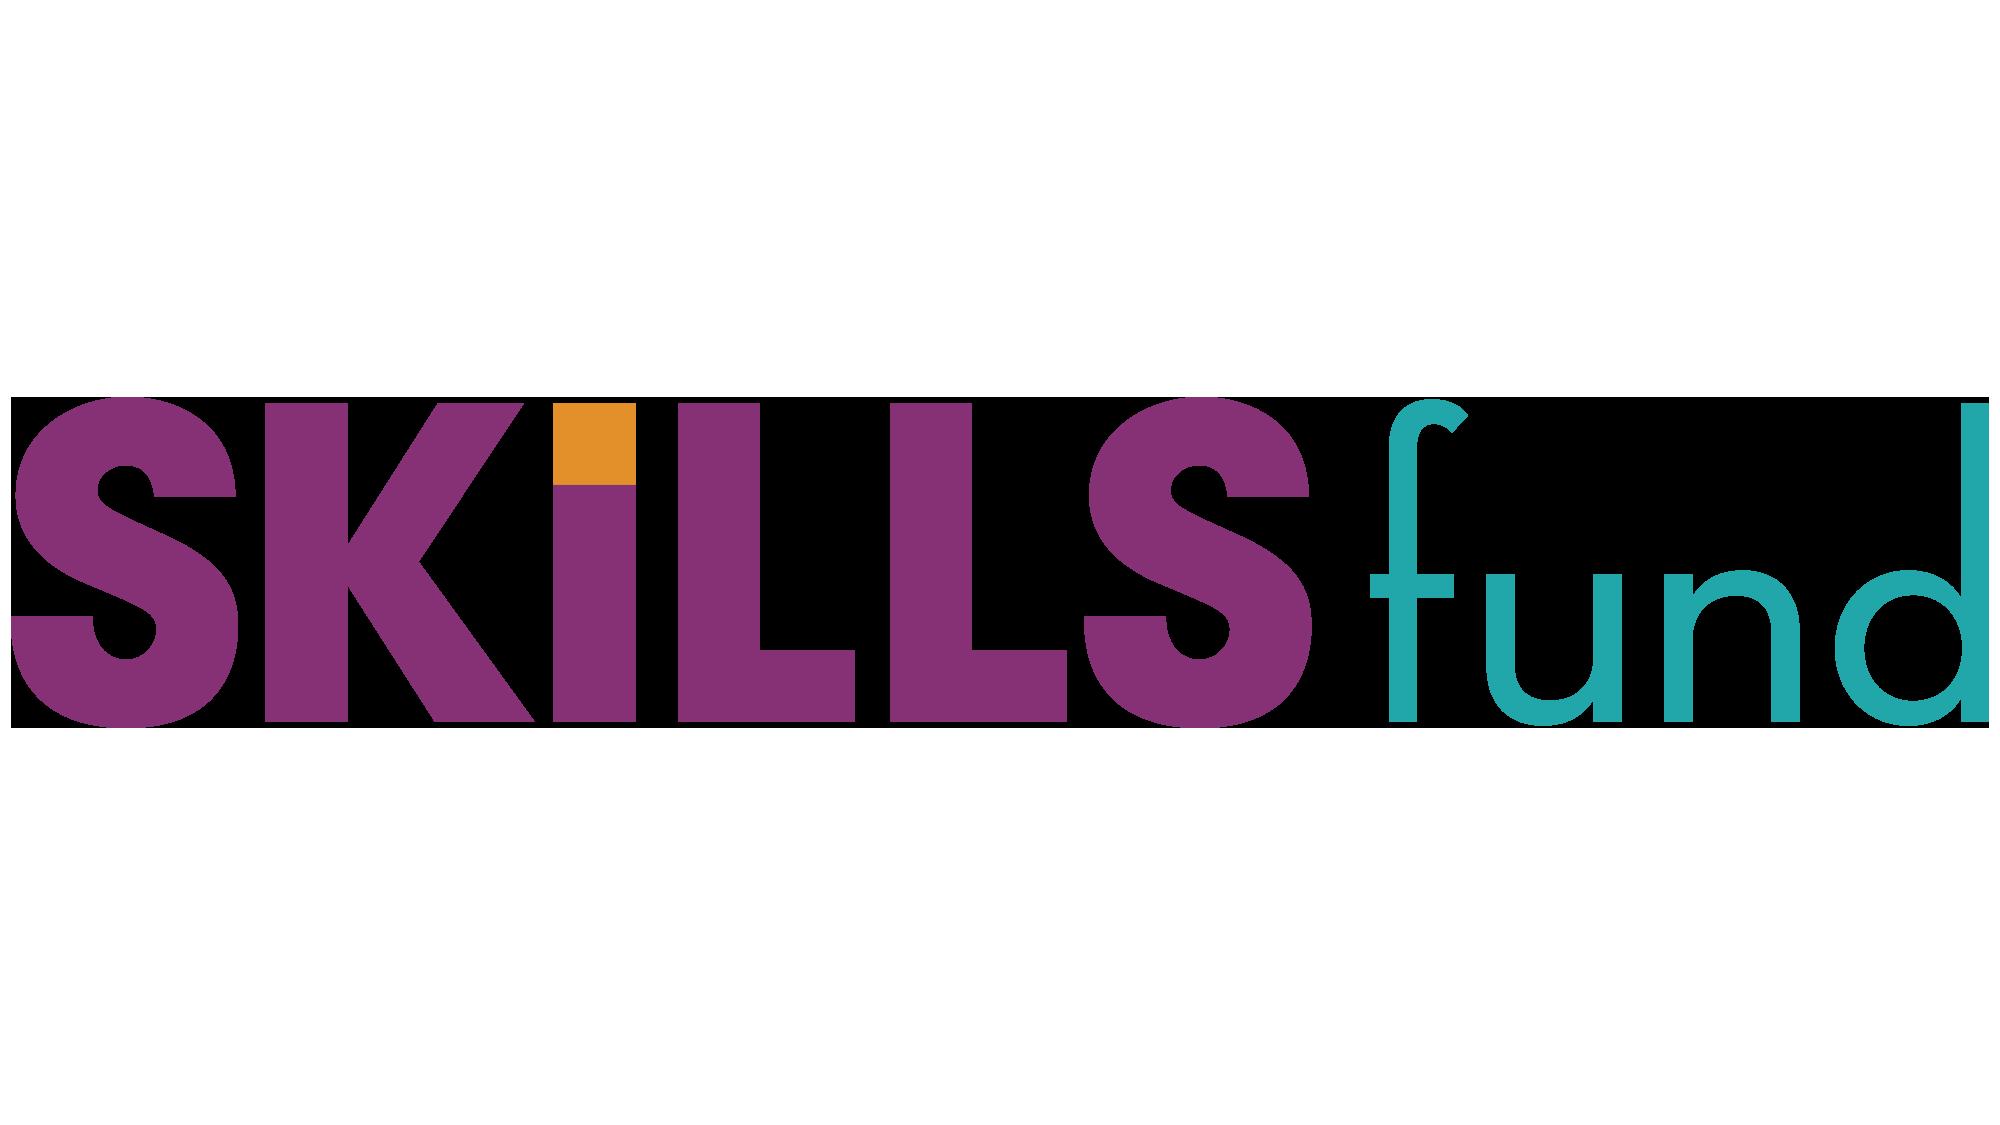 Skills Fund Bootcamp Loan